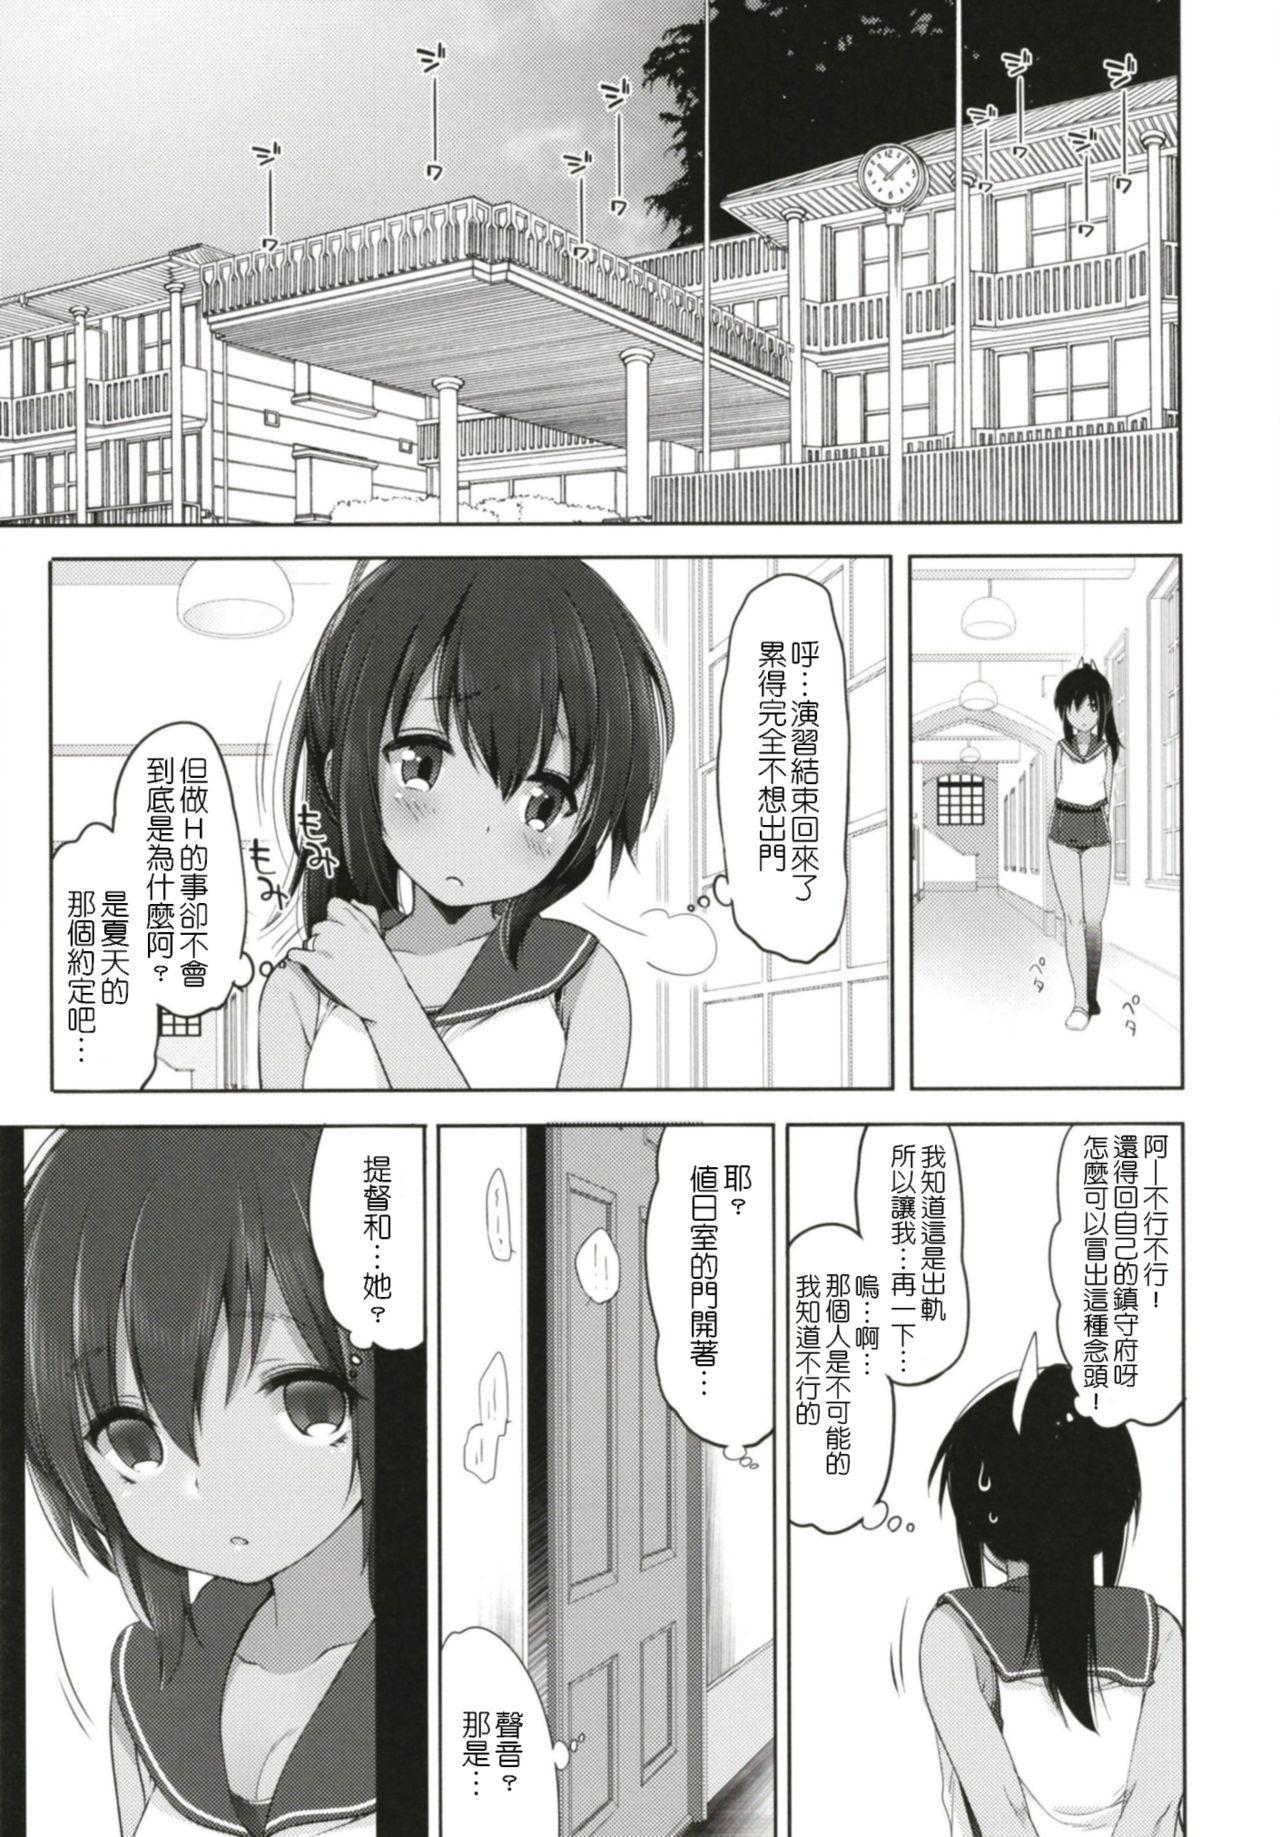 [French letter (Fujisaki Hikari)] Hitonatsu no Ayamachi -I-401 Soushuuhen- (Kantai Collection -KanColle-) [Chinese] [Digital] 60